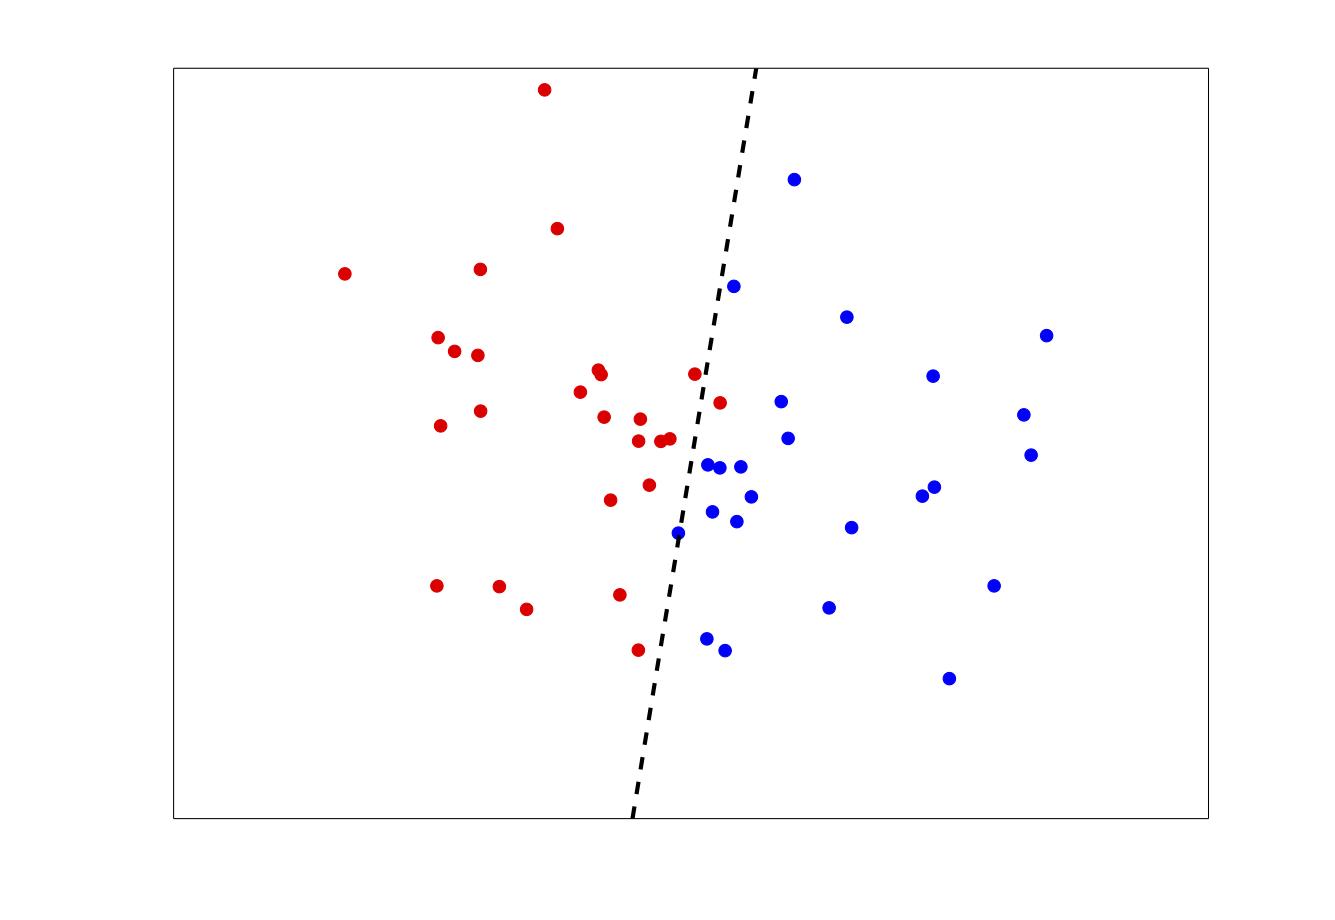 Bayesian classifier matlab code example